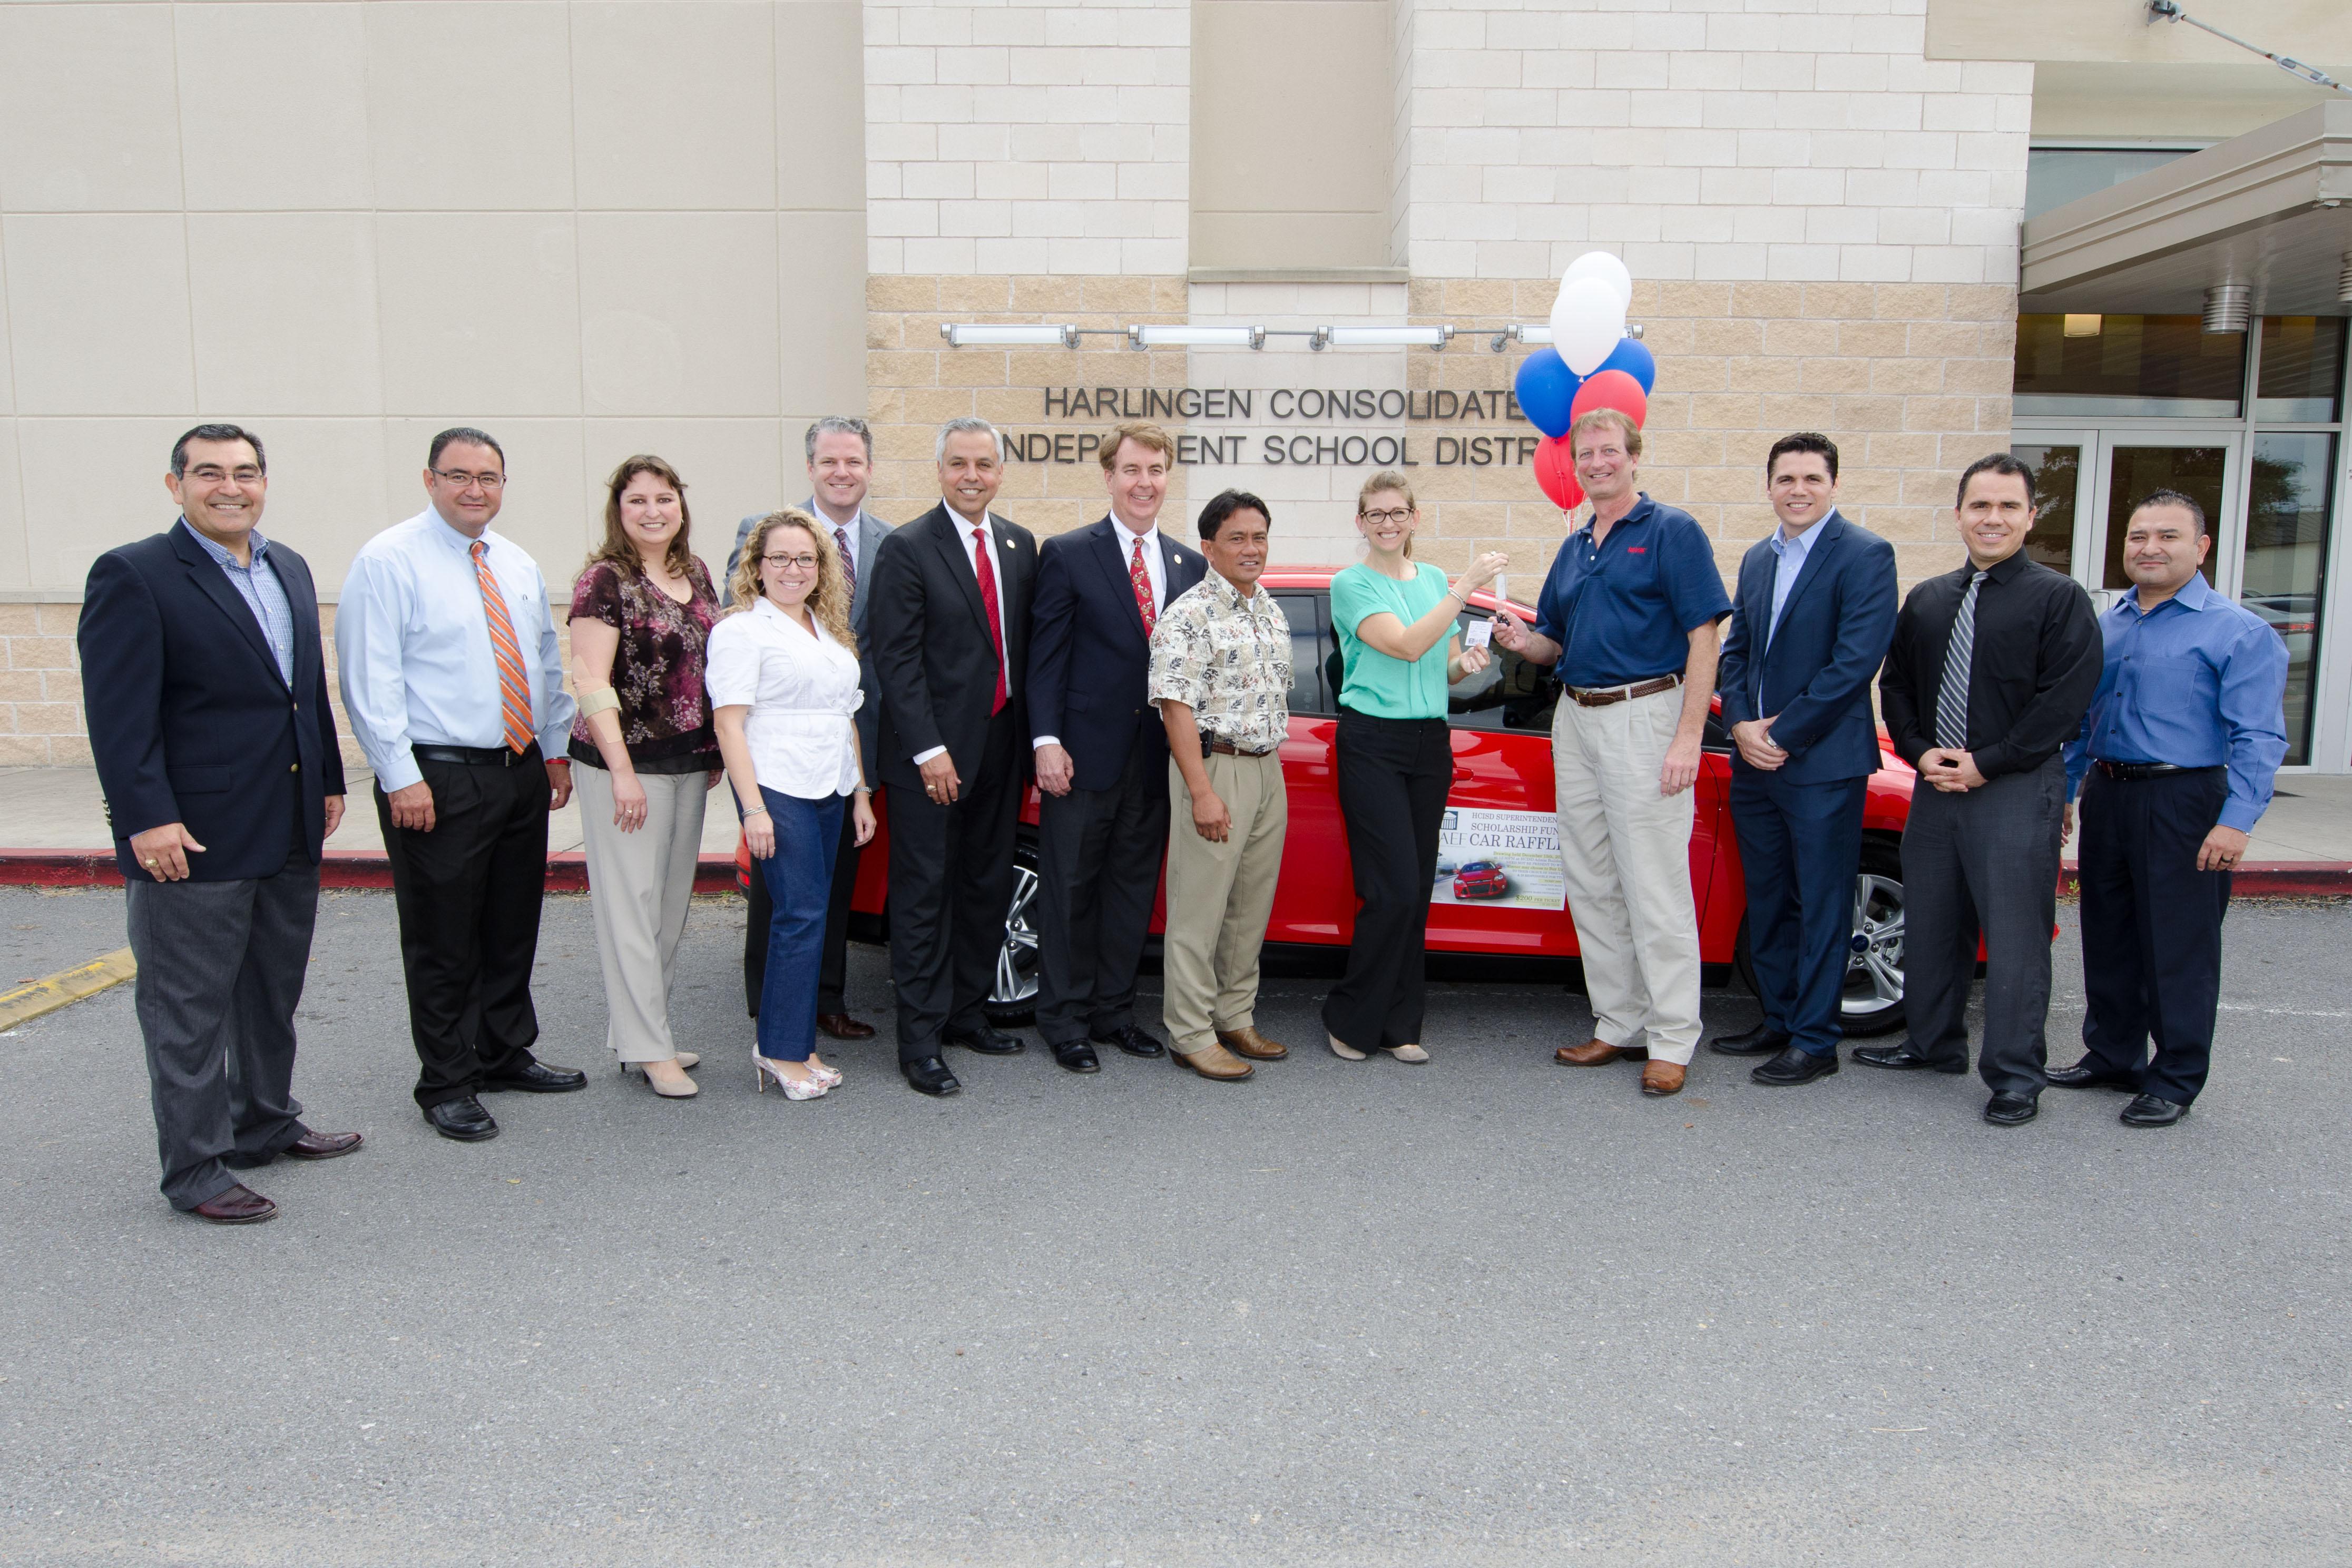 HAEF announces winner of car raffle to benefit education programs